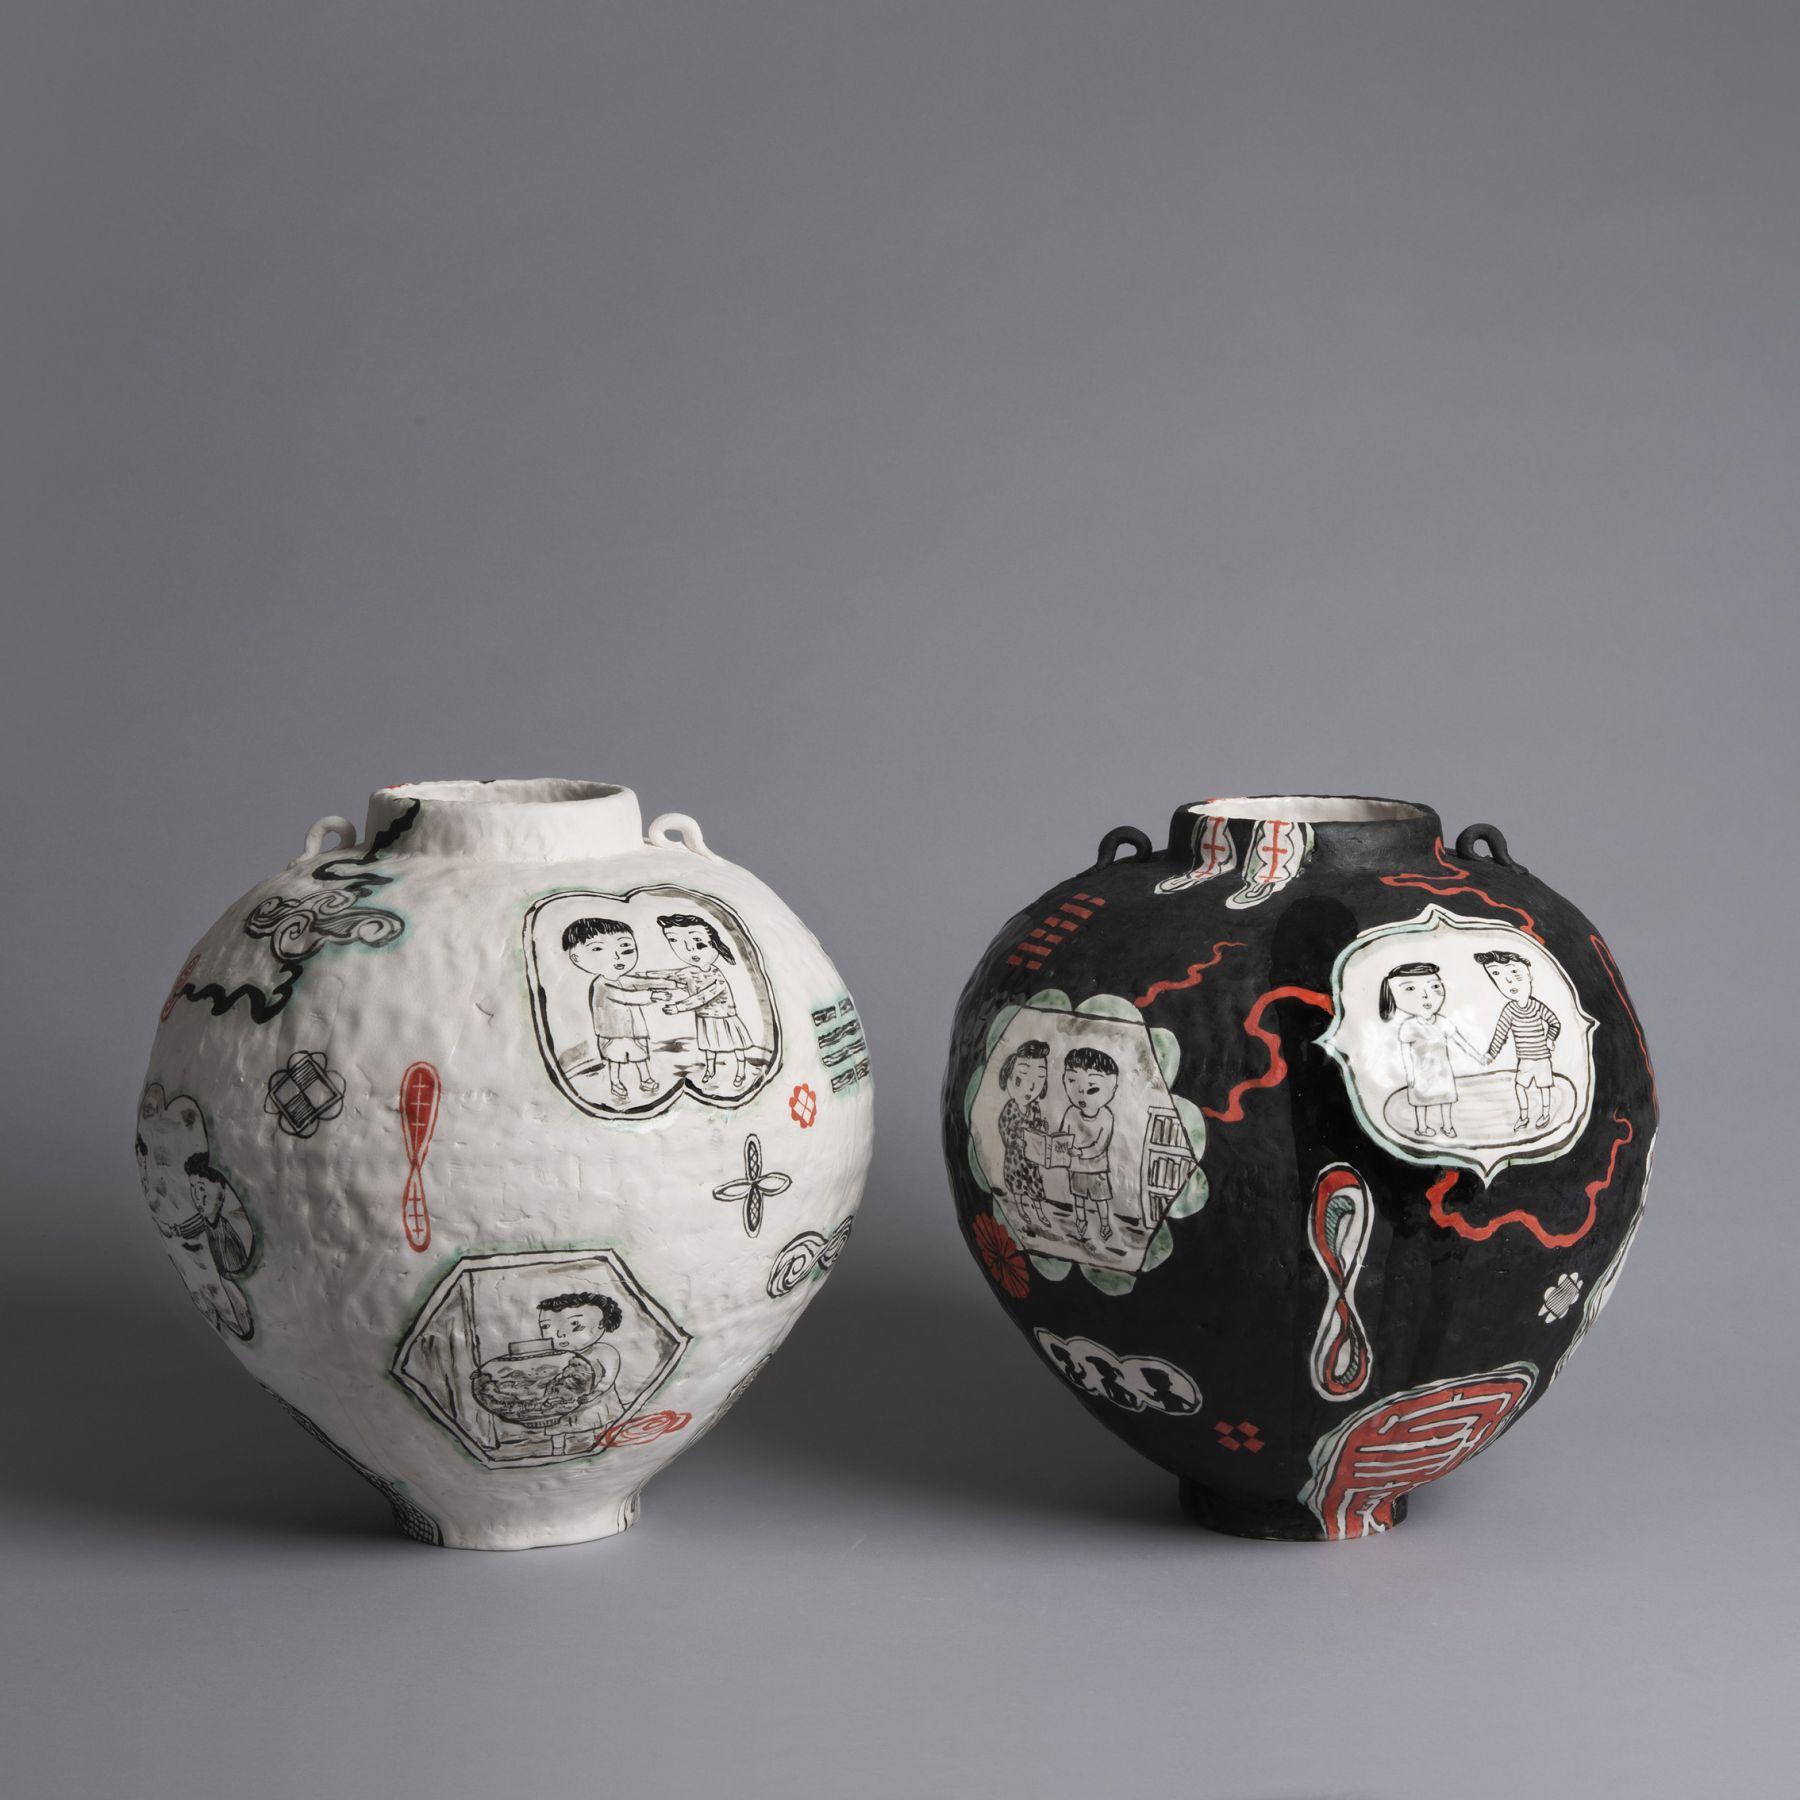 Beth Lo Black and White Vases